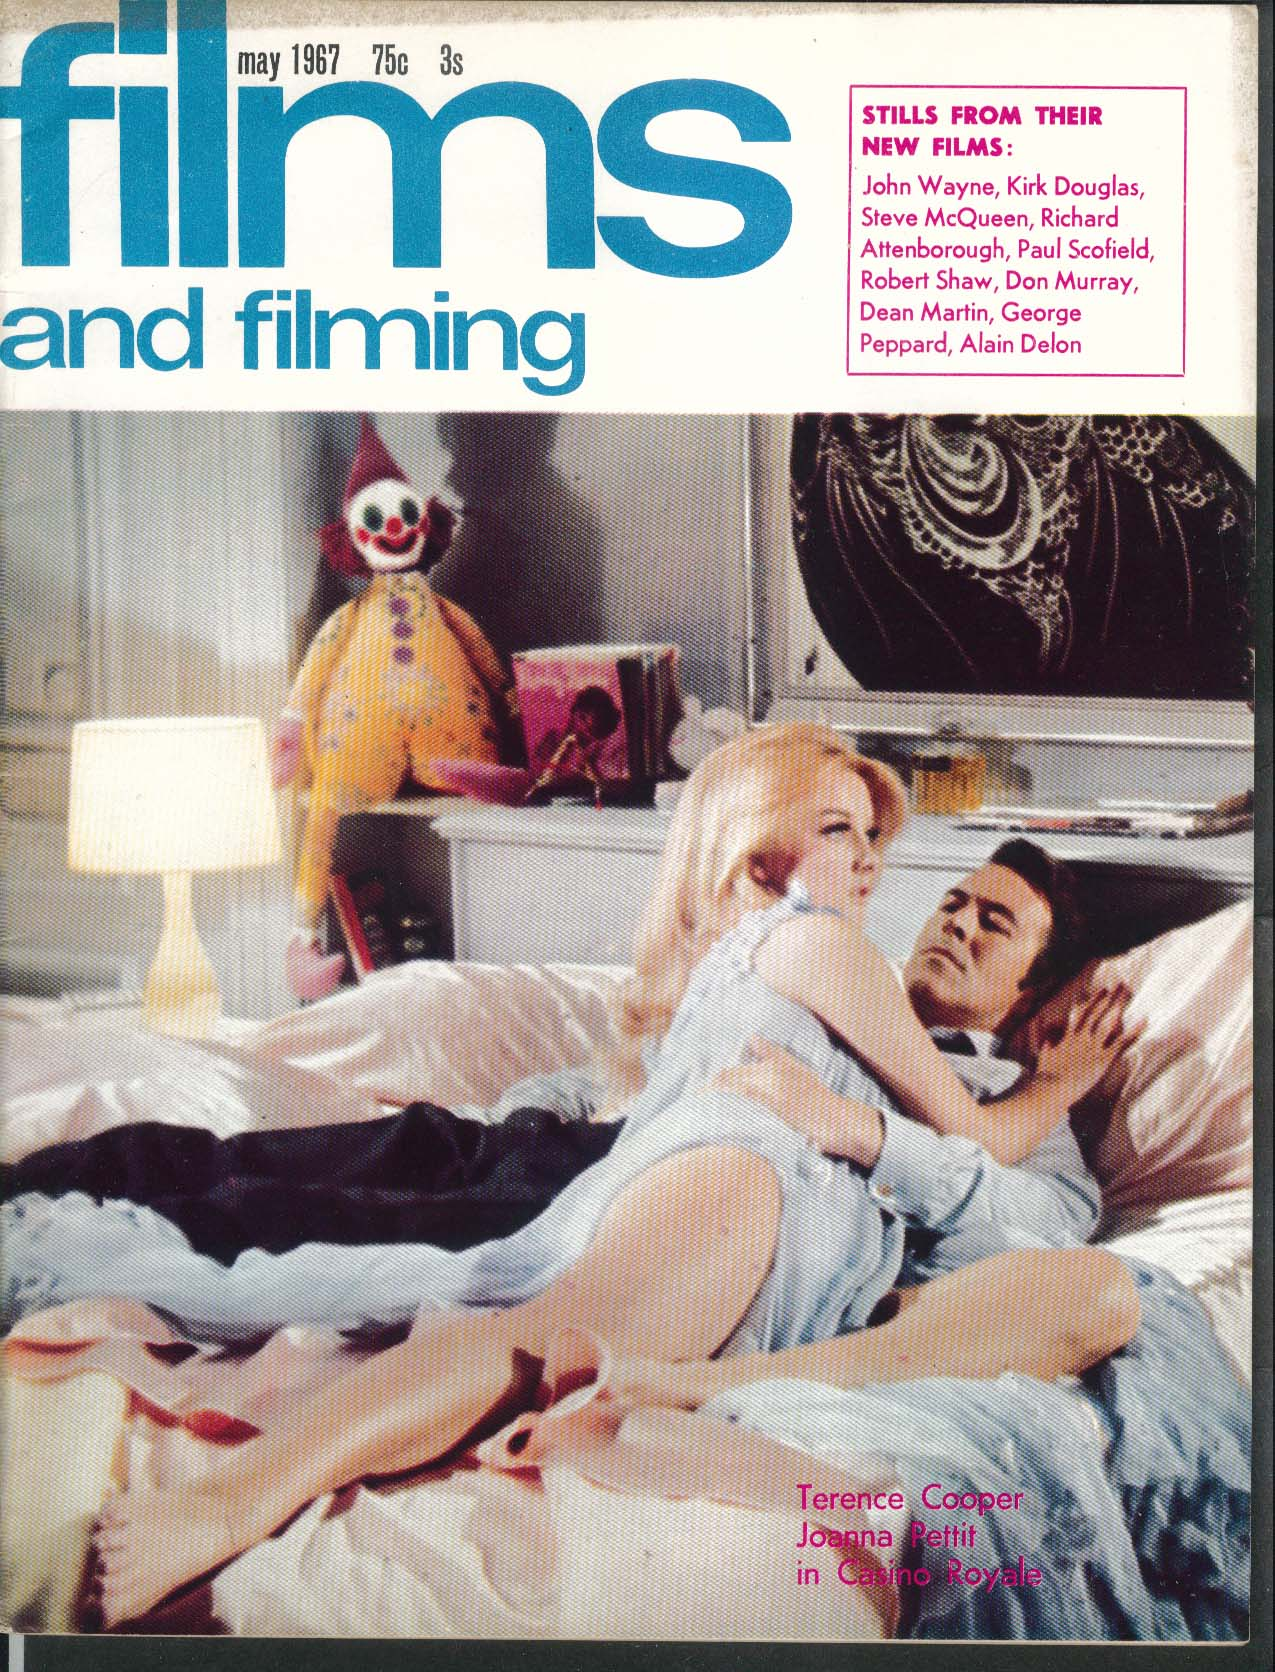 FILMS & FILMING Richard Attenborough Zinnemann Saul Kahan Casino Royale + 5 1967